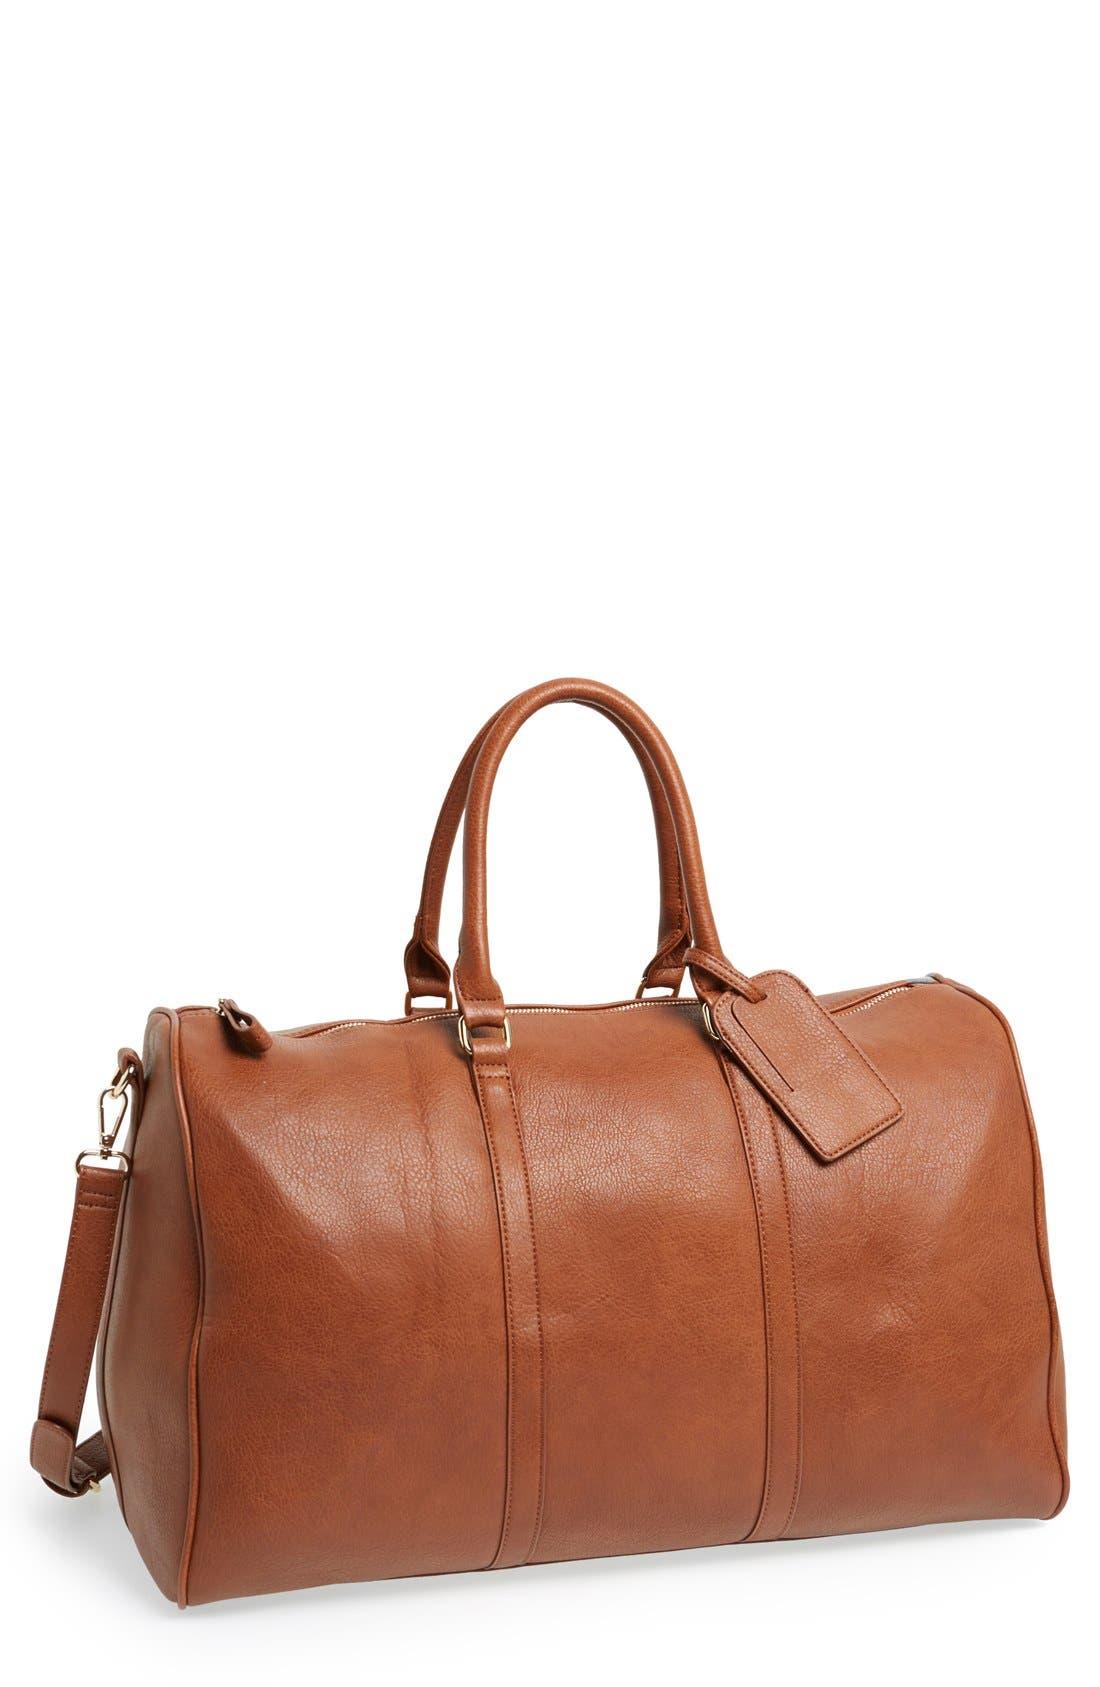 'Lacie' Faux Leather Duffel Bag,                             Main thumbnail 1, color,                             BROWN